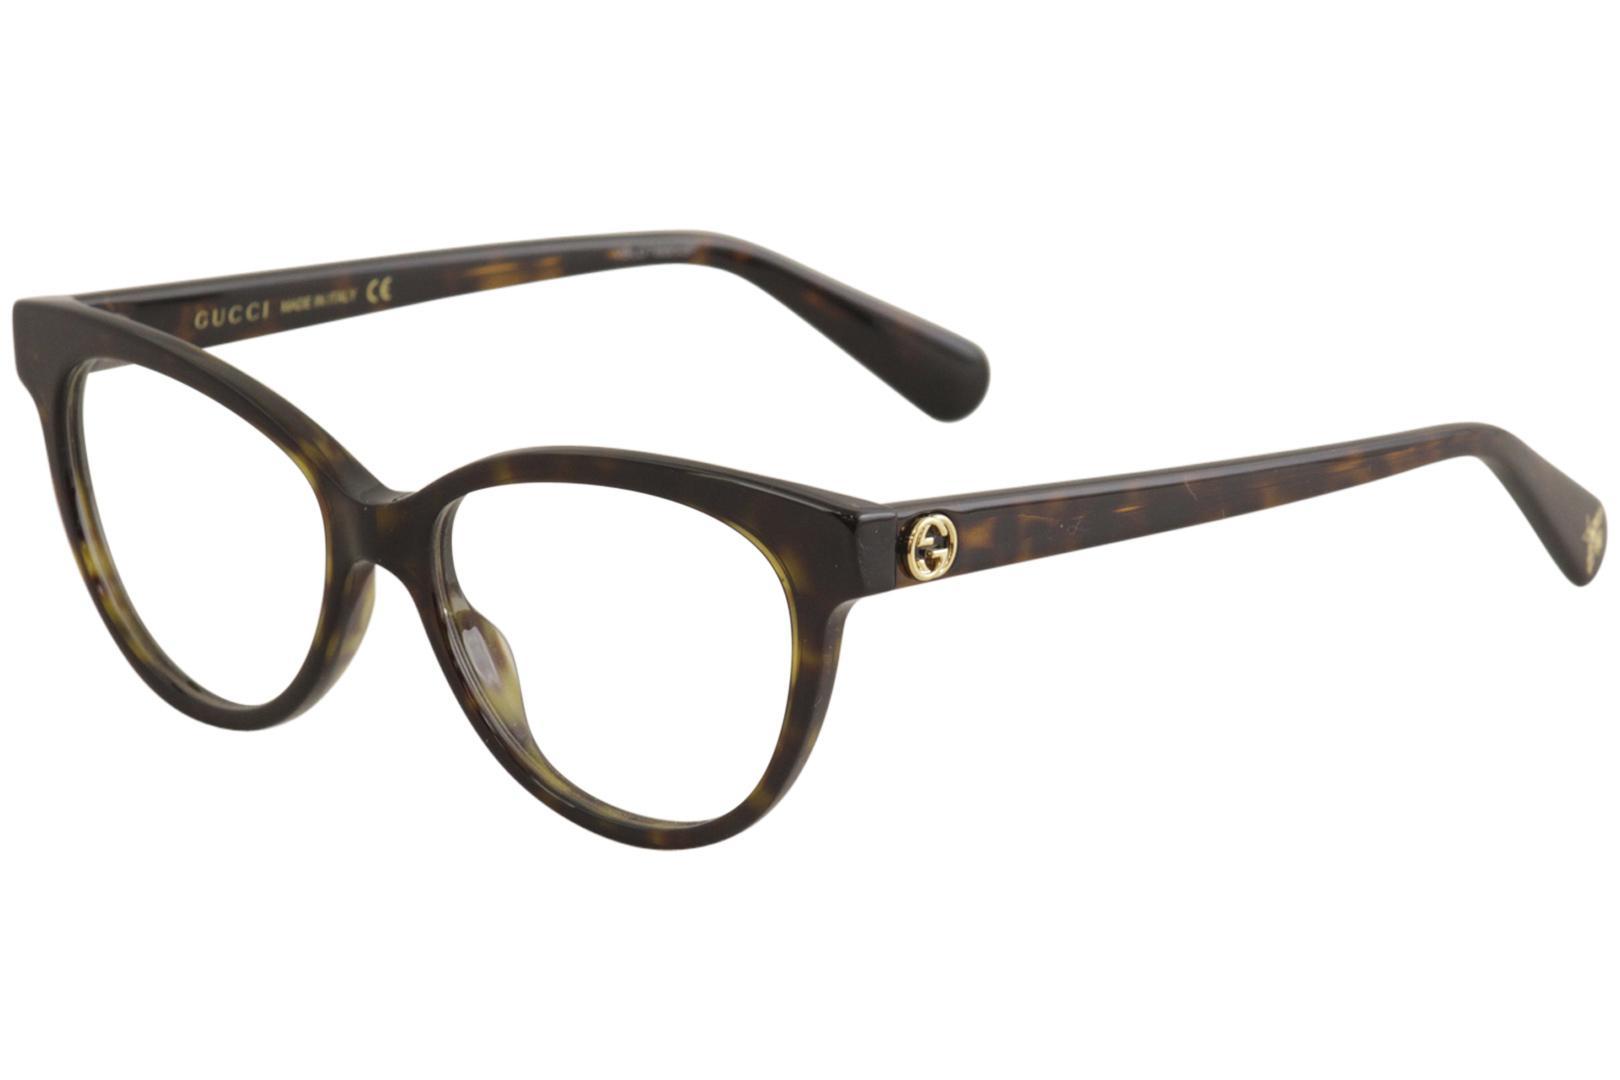 964dcfa9367f Gucci Women's Eyeglasses GG0373O GG/0373/O Full Rim Optical Frame